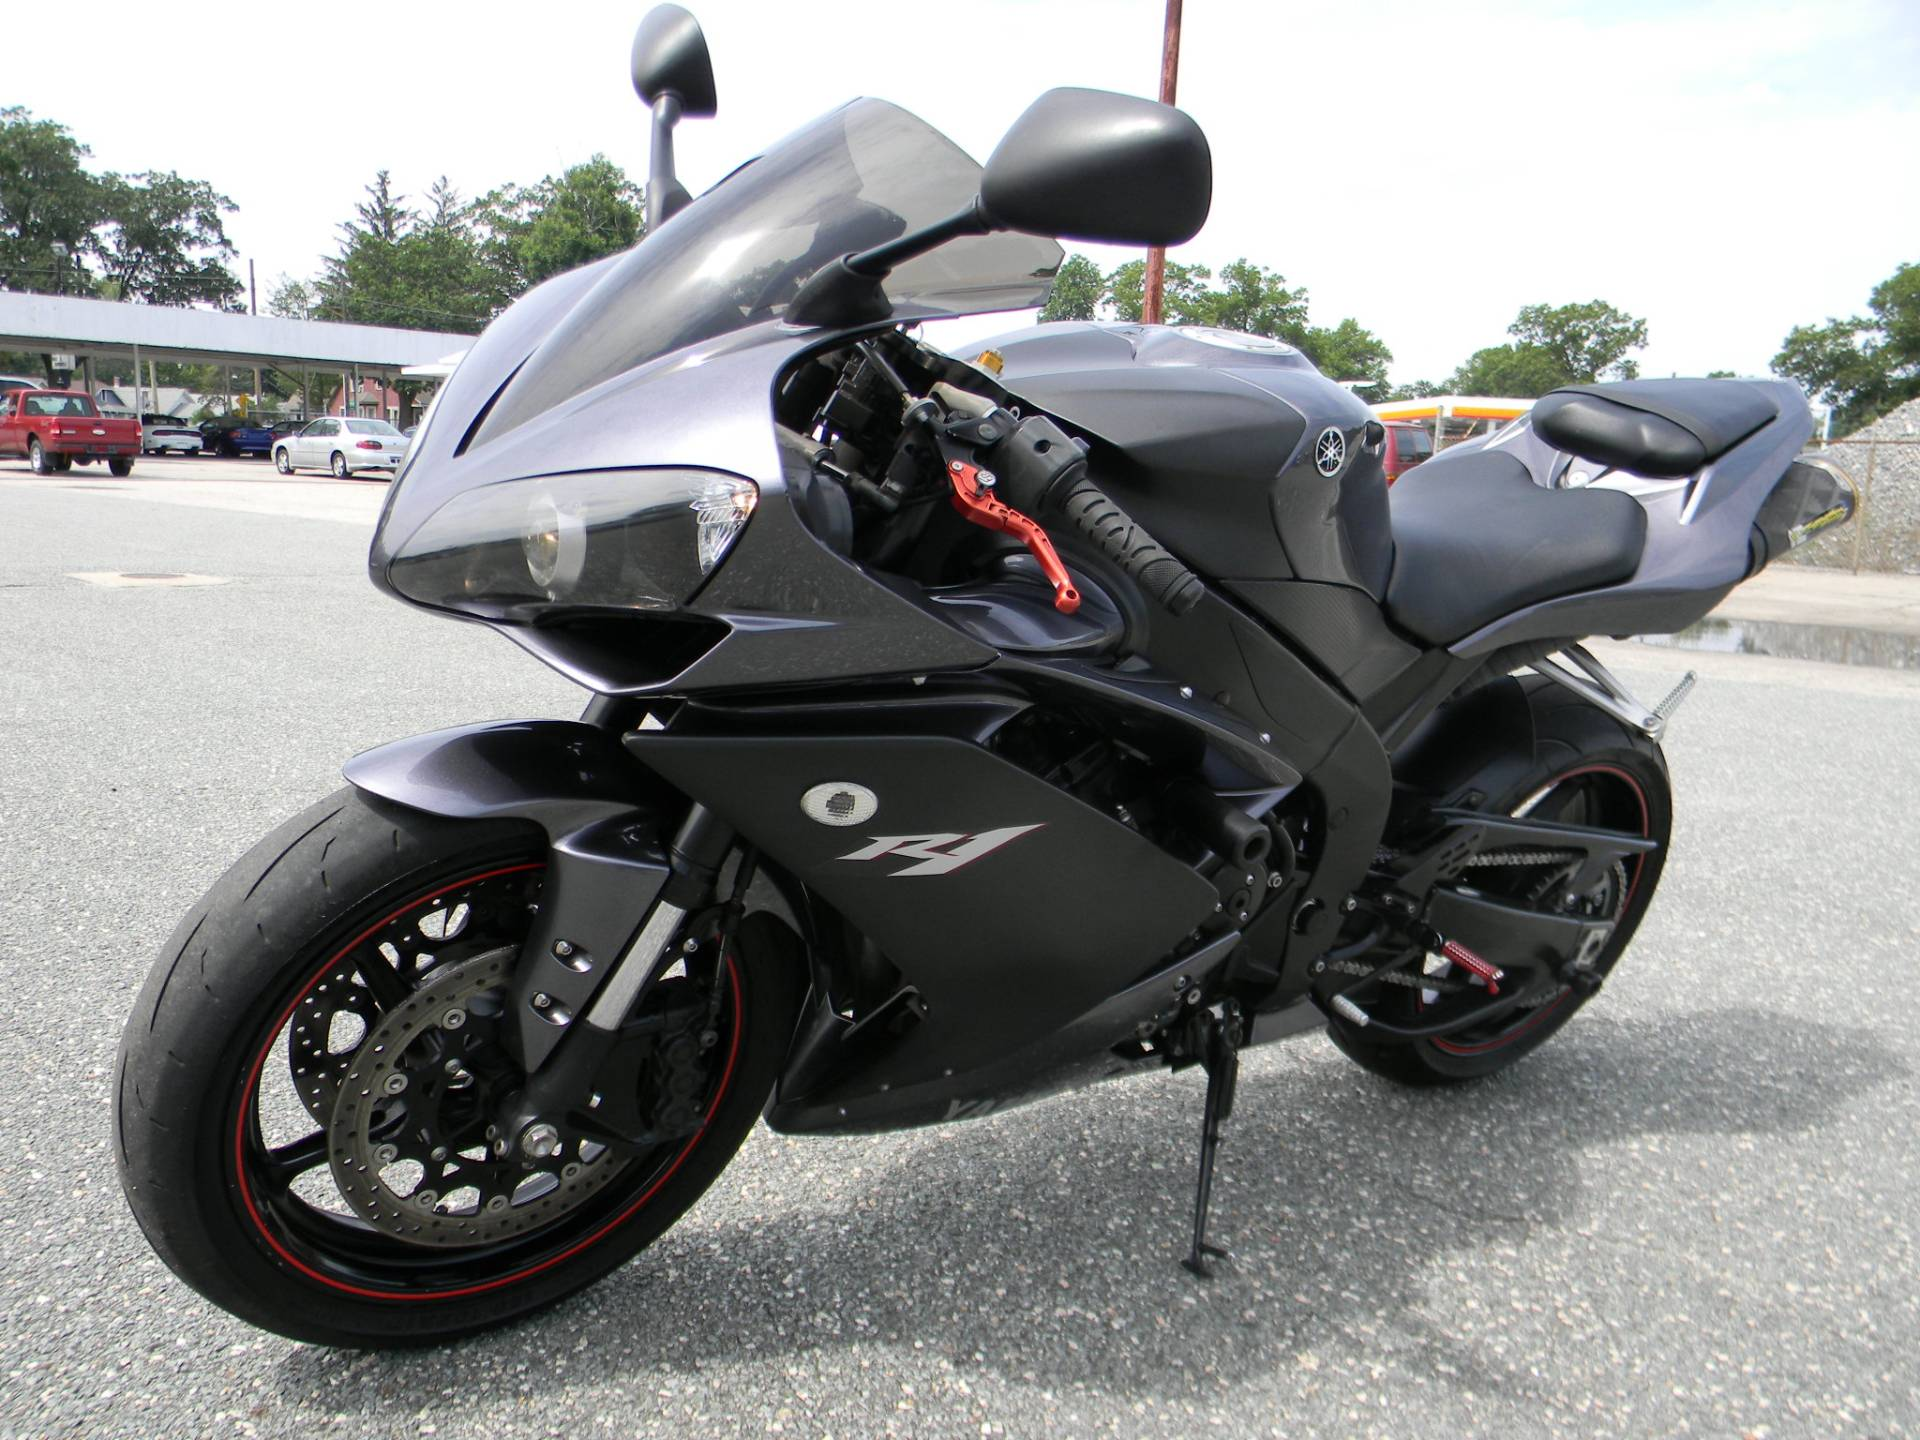 2007 Yamaha YZF-R1 4